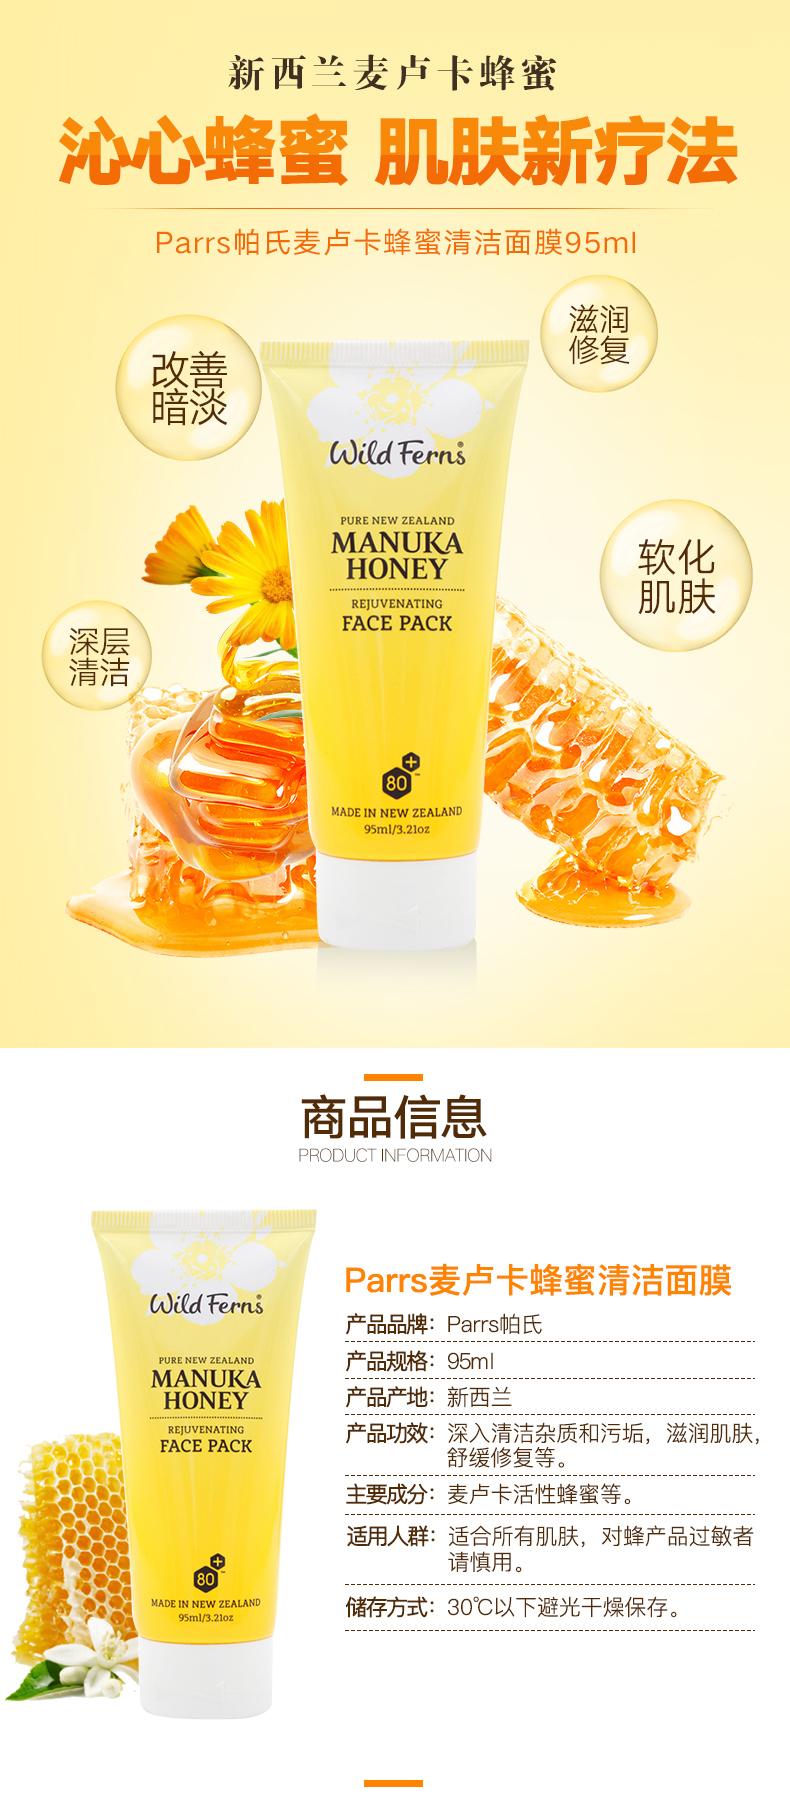 Parrs蜂蜜面膜_01.jpg